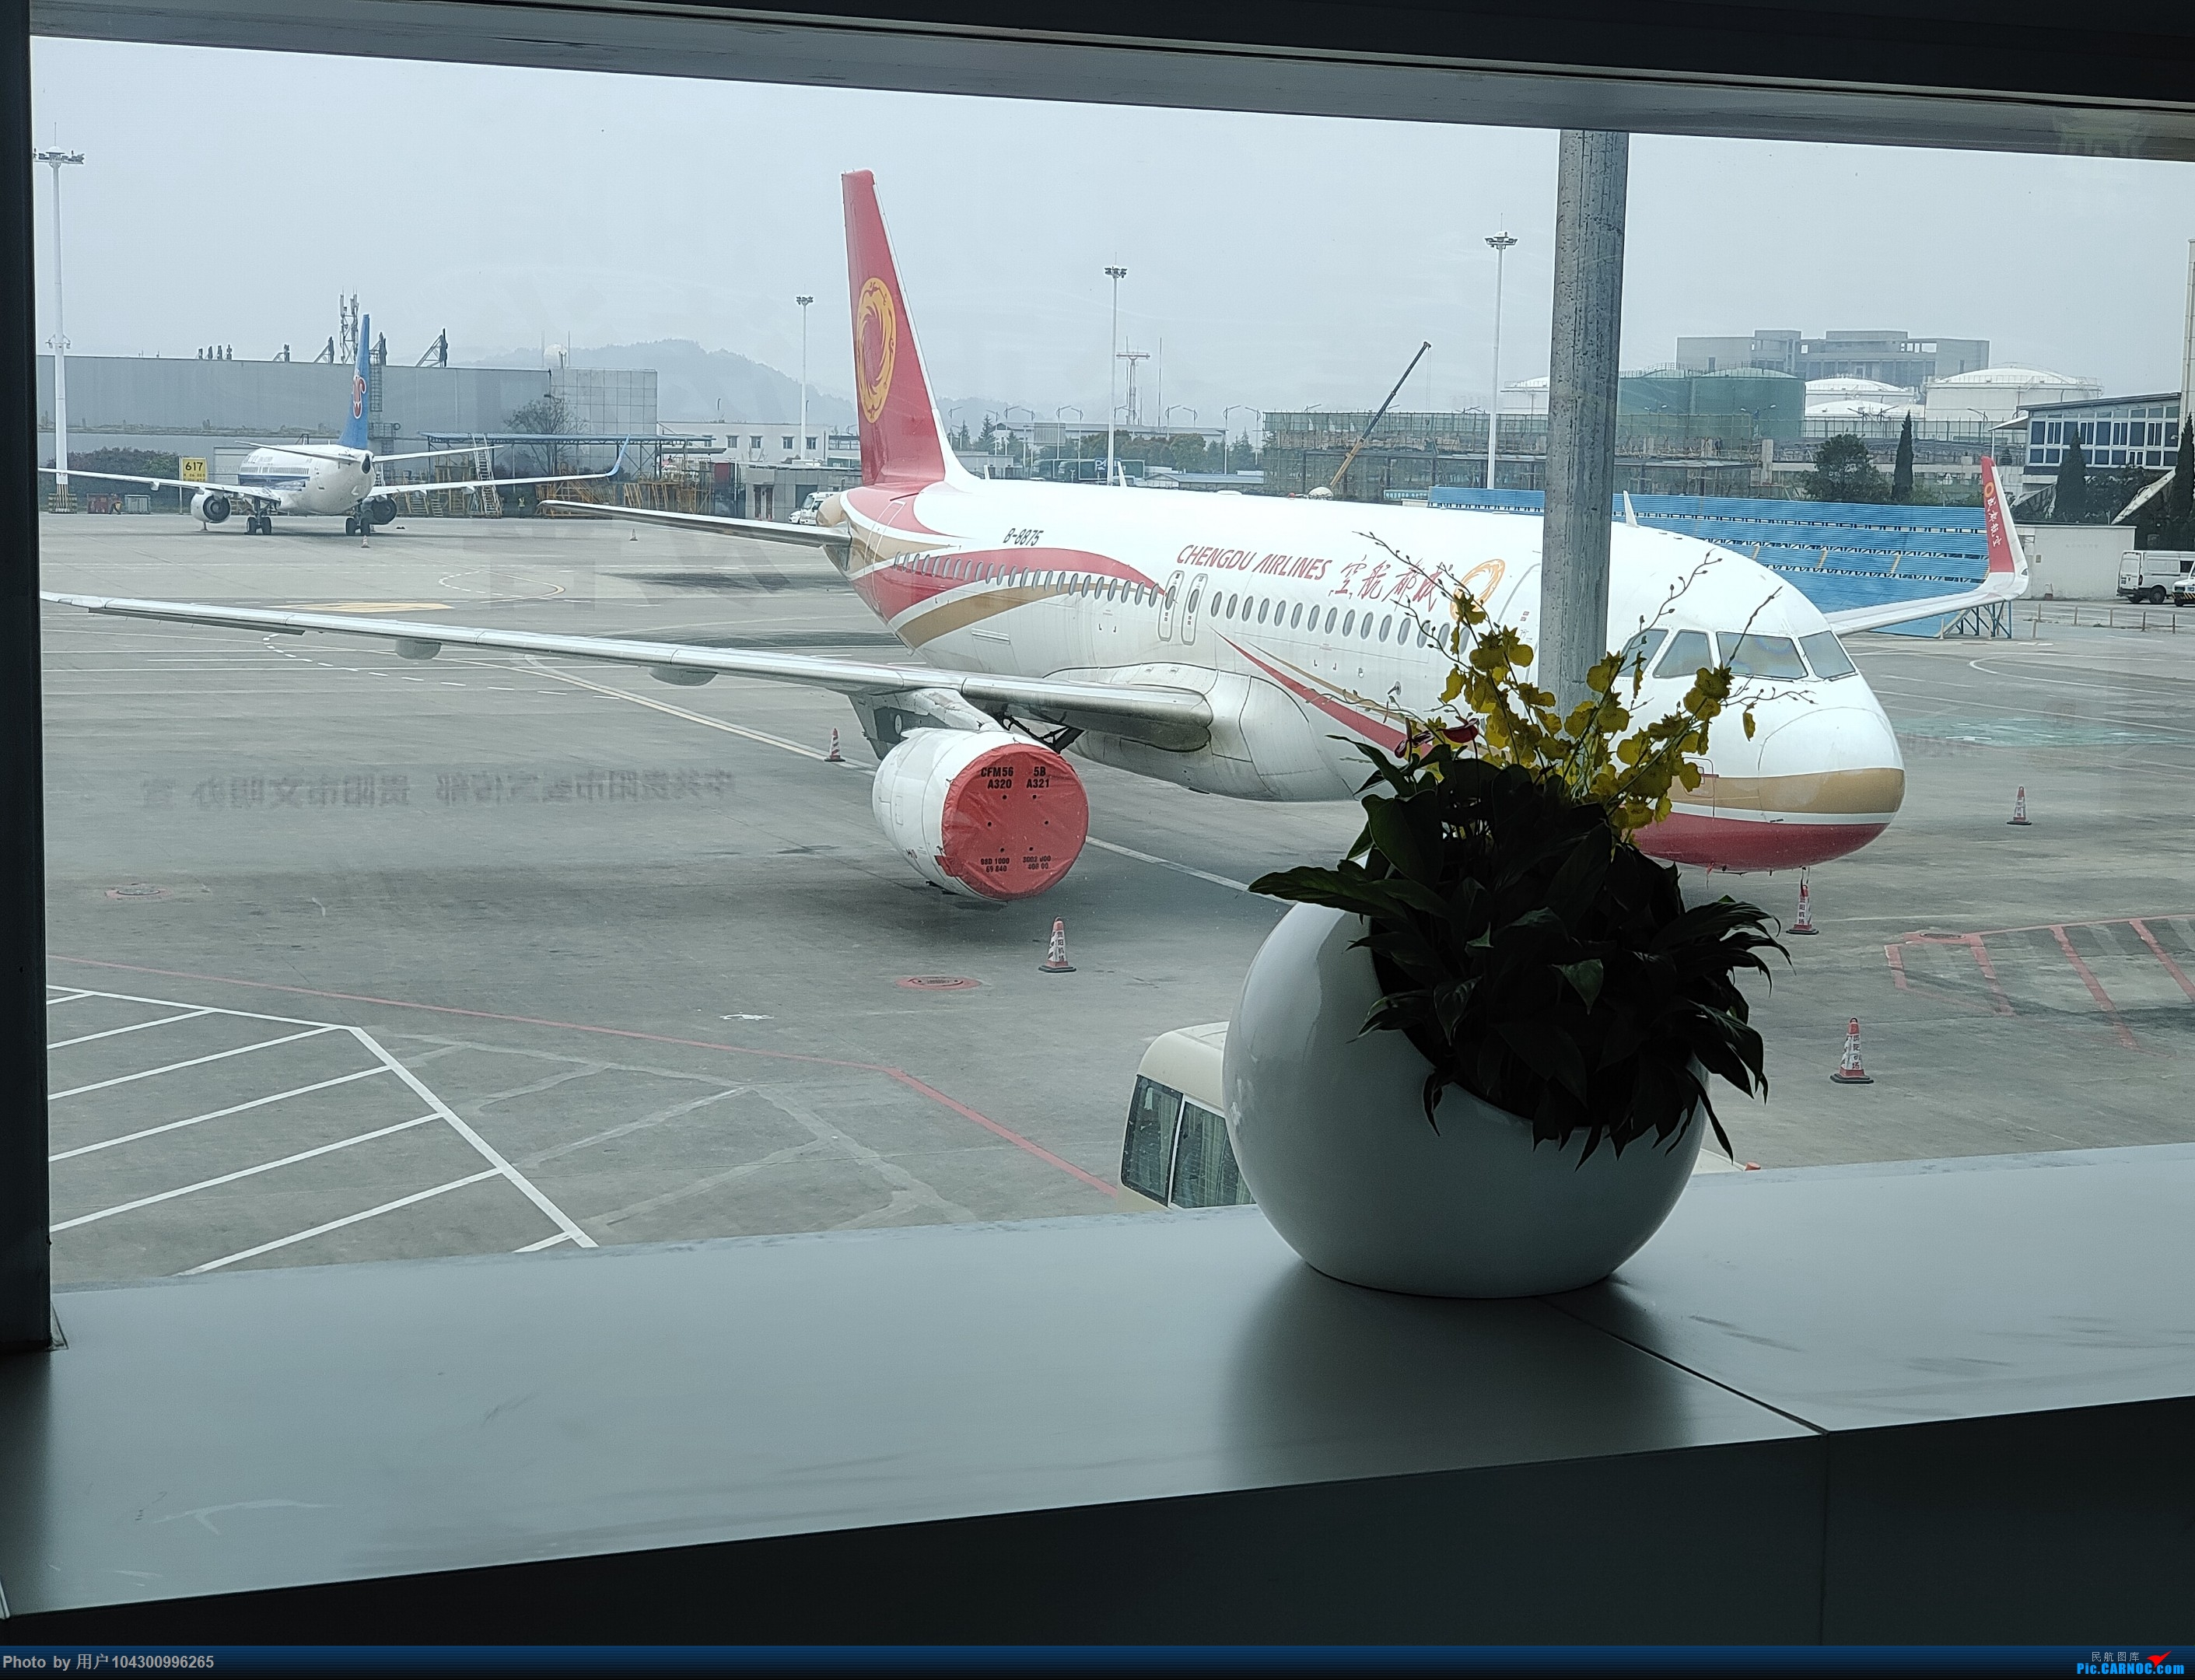 Re:[原创]DM游记之GY贵阳-成都往返(参观空港花田) AIRBUS A320-200 B-8875 中国贵阳龙洞堡国际机场